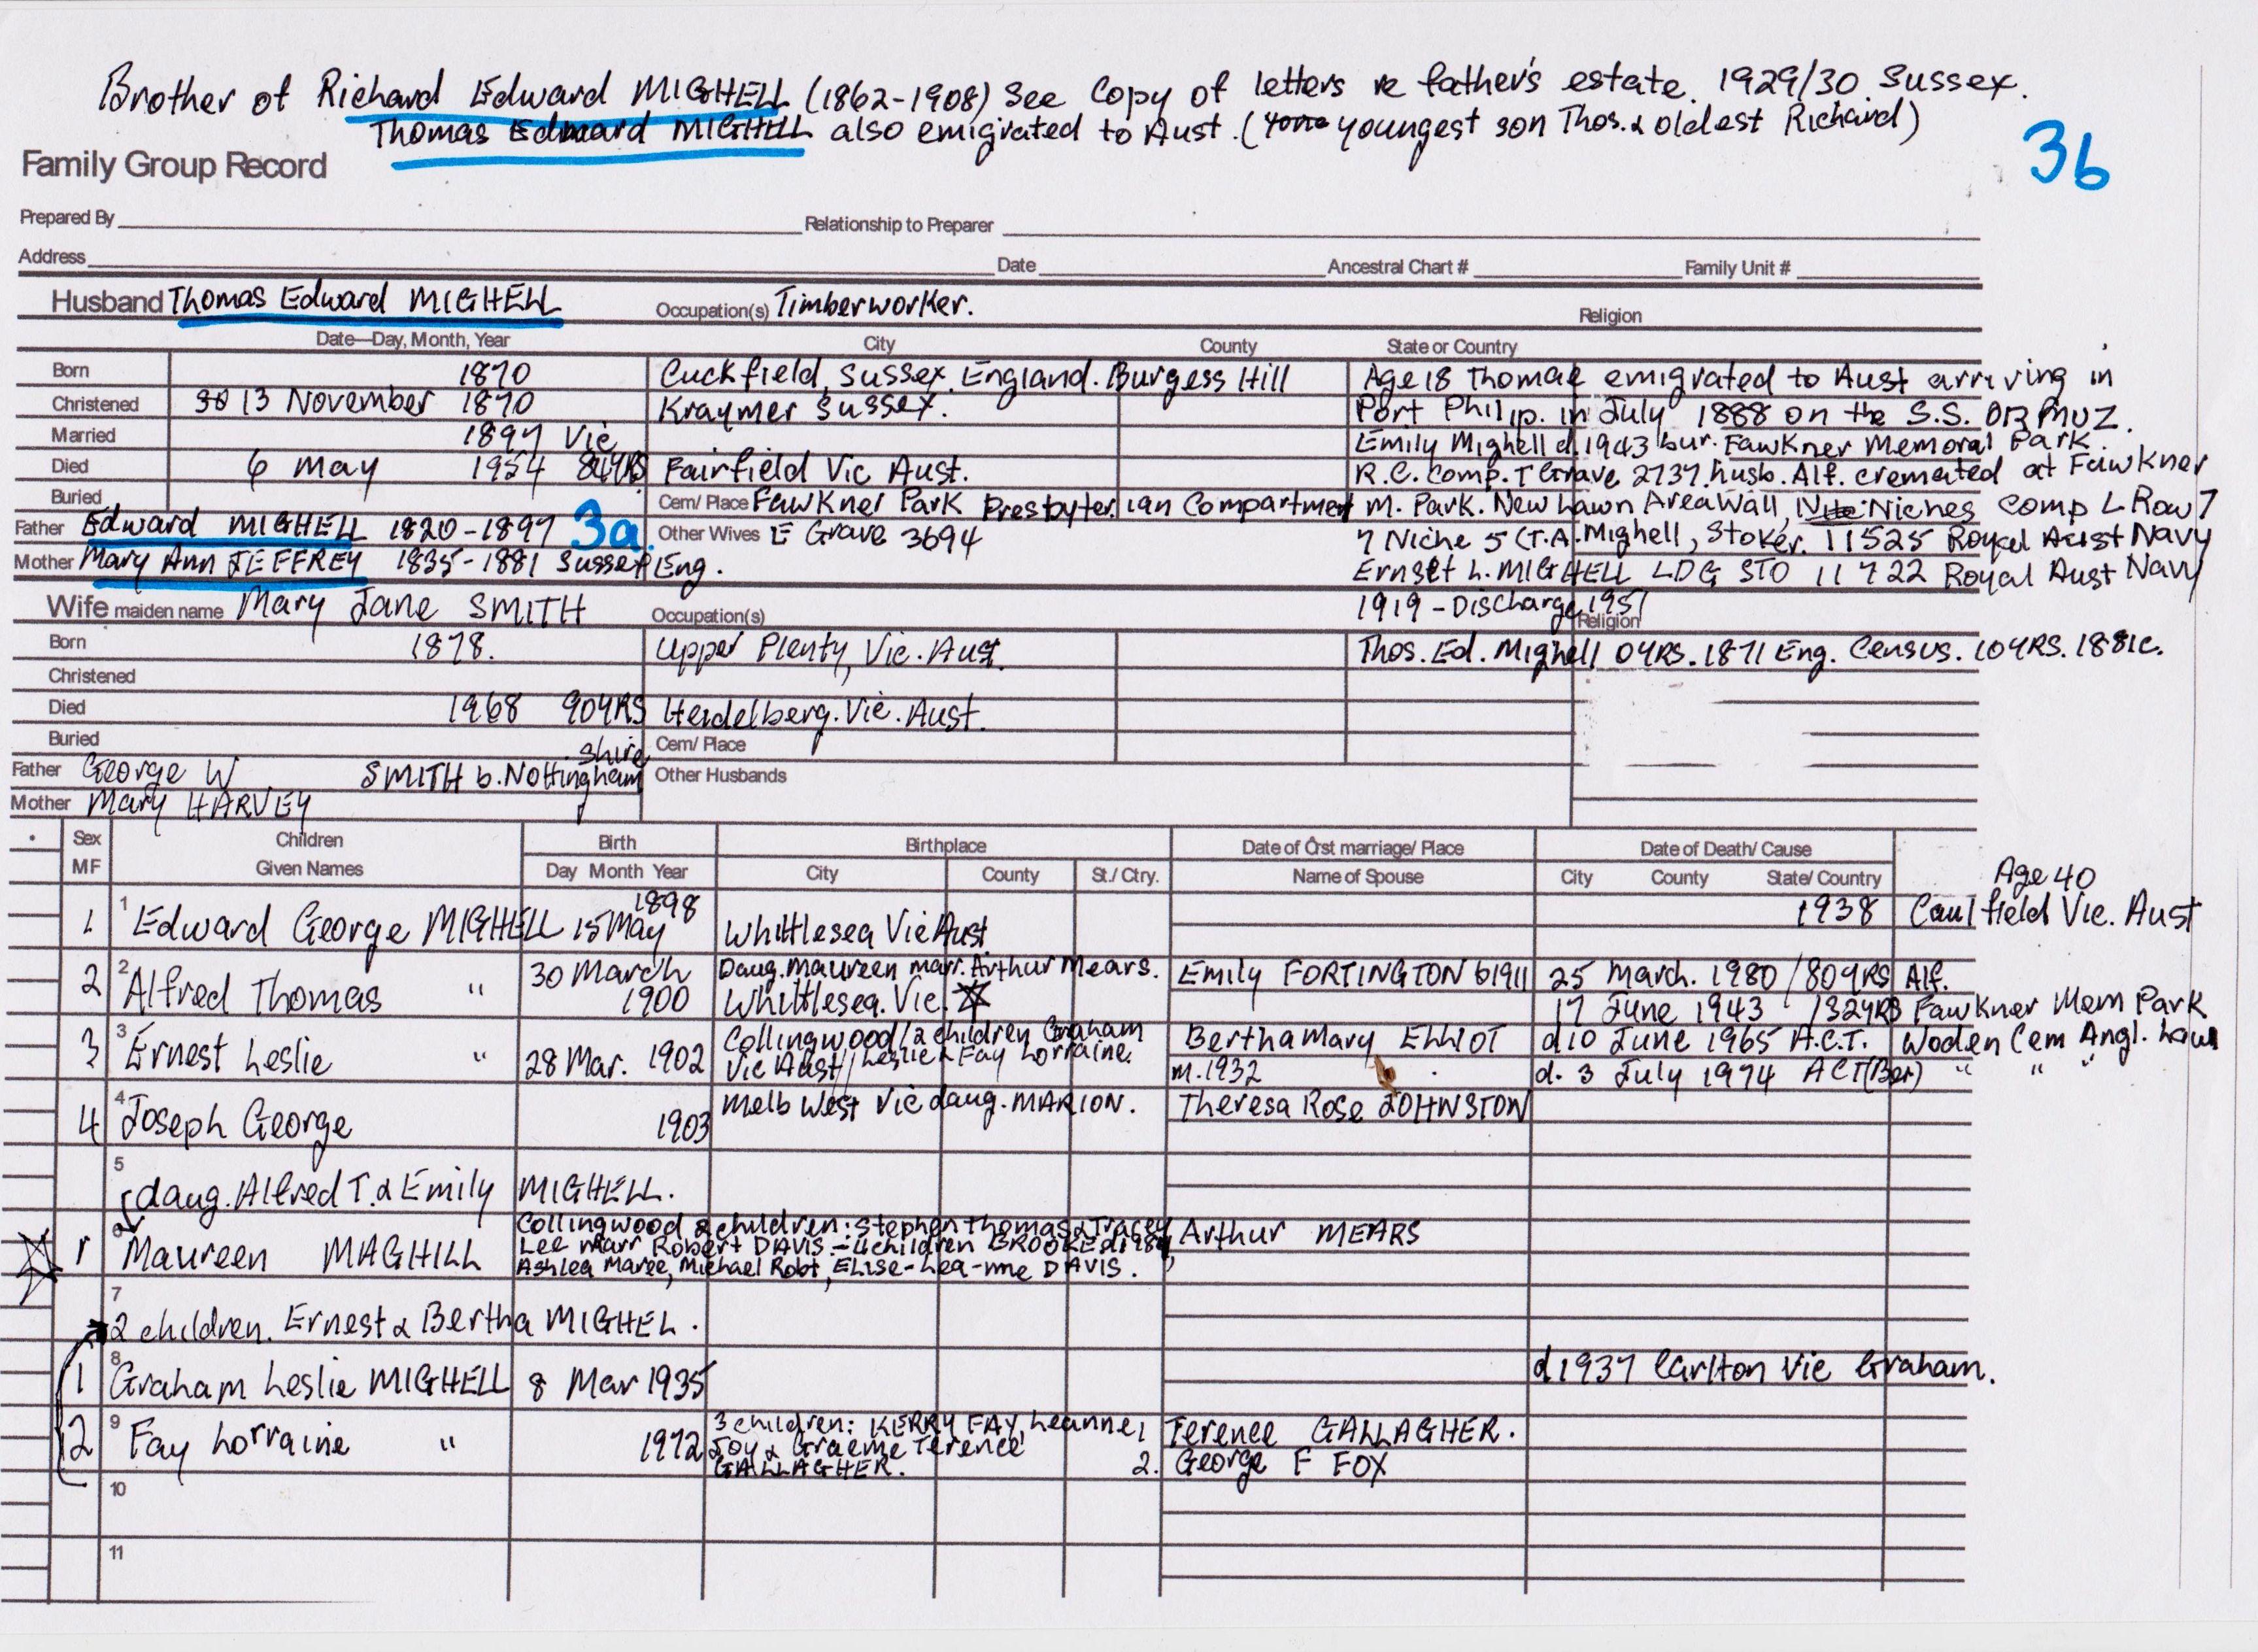 Benson pedigree chart 4 showing no 1 peter ellen parkinson benson pedigree chart 4 showing no 1 peter ellen parkinson family tree chart 10 dennis elizabeth parkinson ftc 11 2 3 pedigree cha nvjuhfo Choice Image